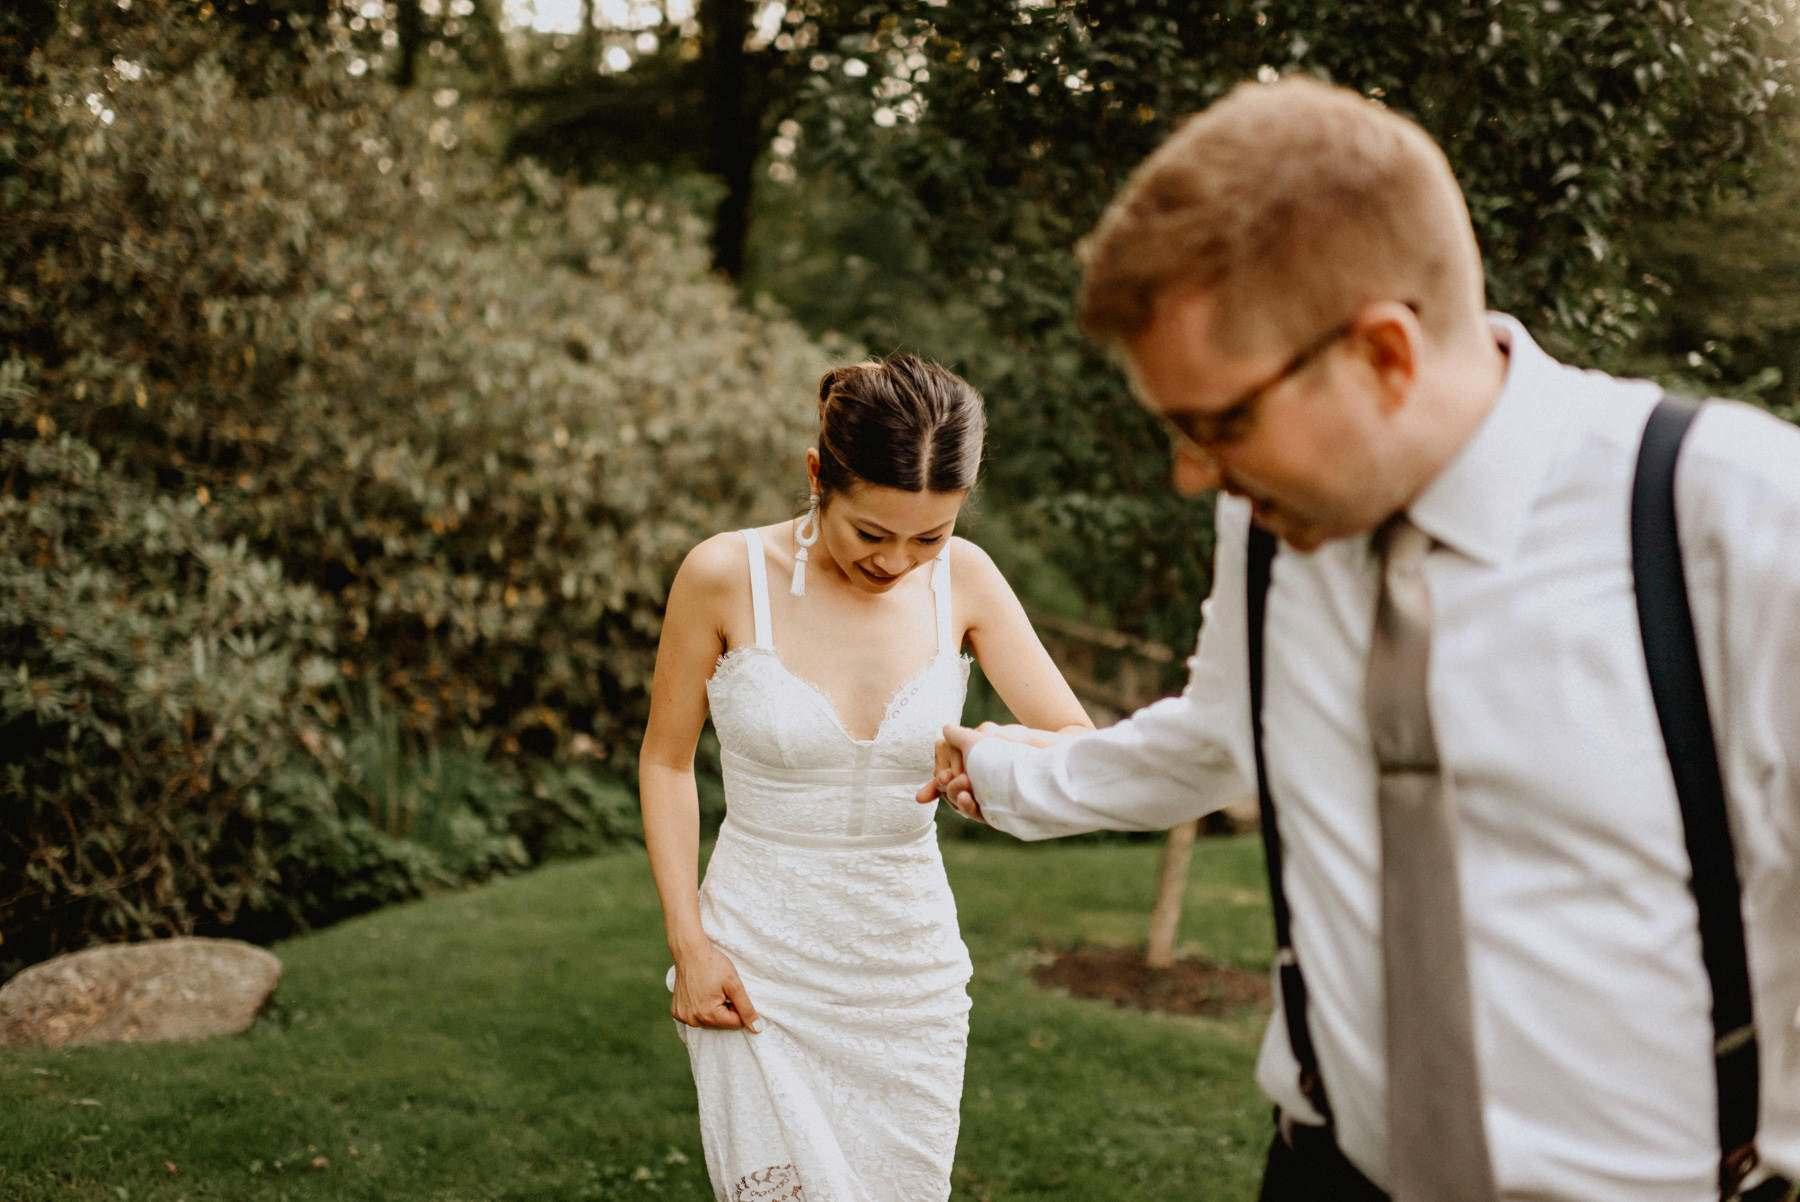 Appleford-estate-wedding-139.jpg